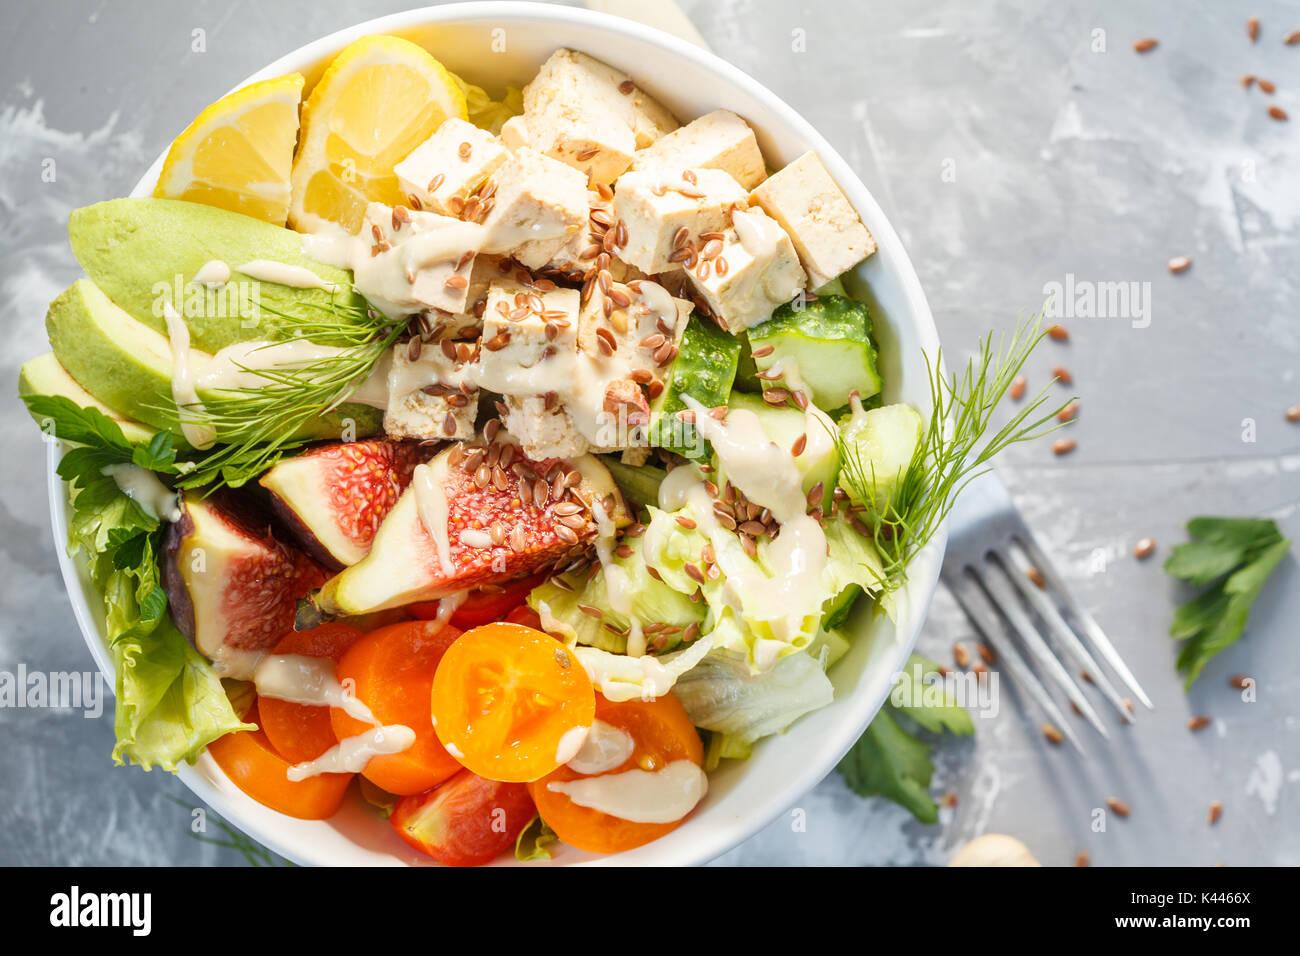 buddha bowl, vegan lunch, tofu fruit vegetables salad. - Stock Image